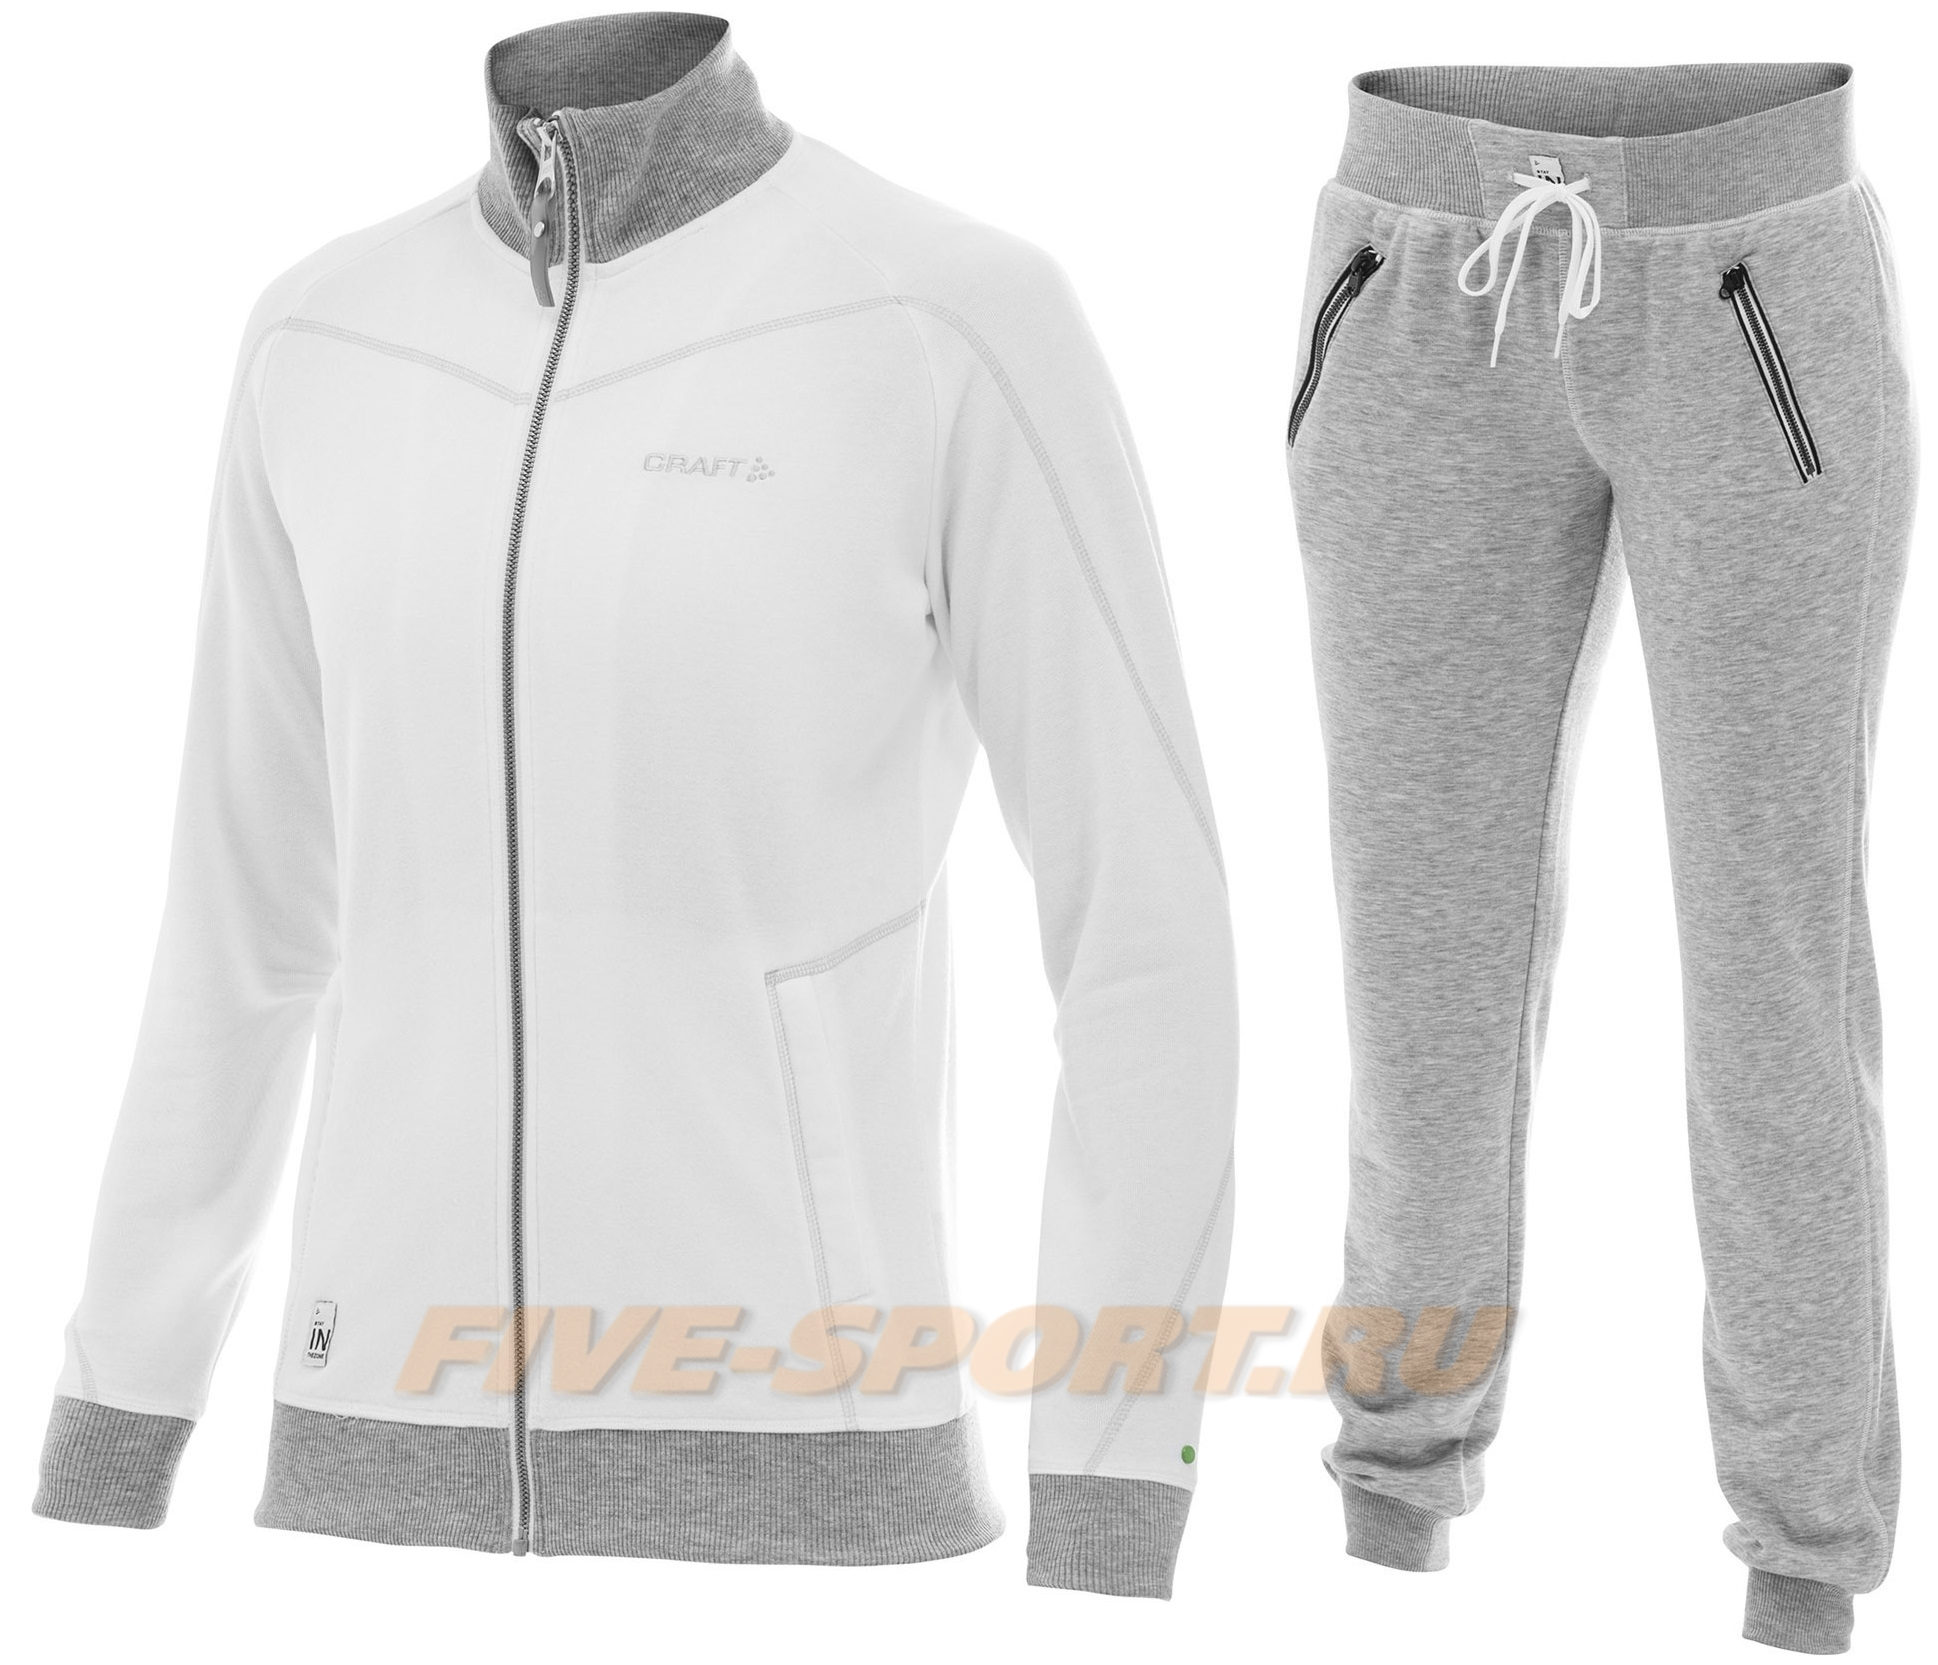 Костюм спортивный женсий Craft In The Zone white для бега